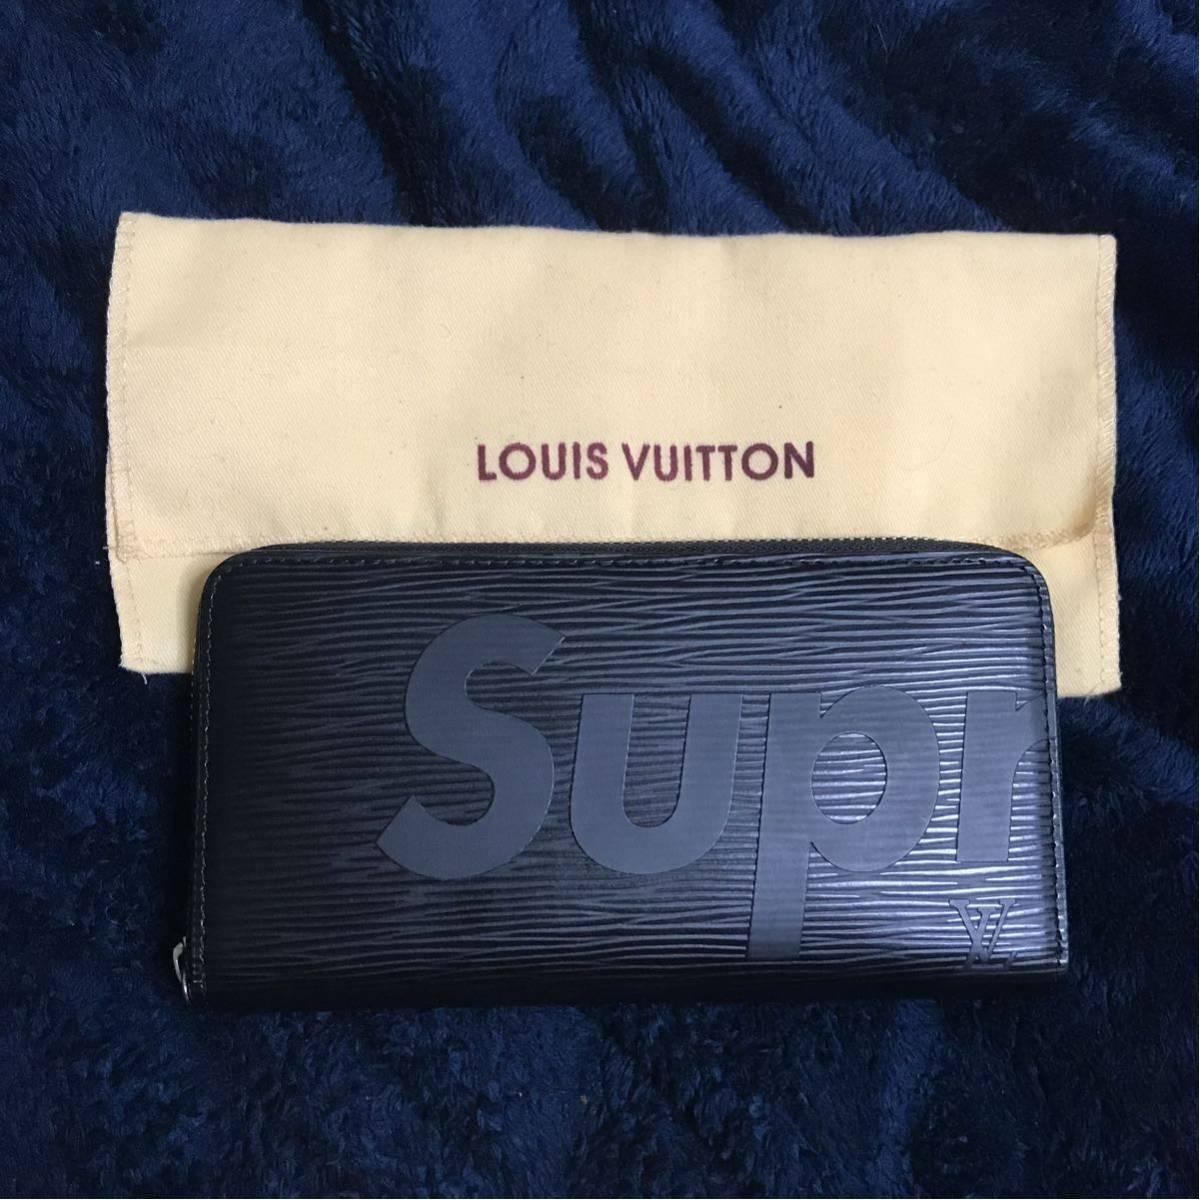 Louis Vuitton Supreme 長財布 エピ ラウンド ジッピー シュプリーム ヴィトン コラボ